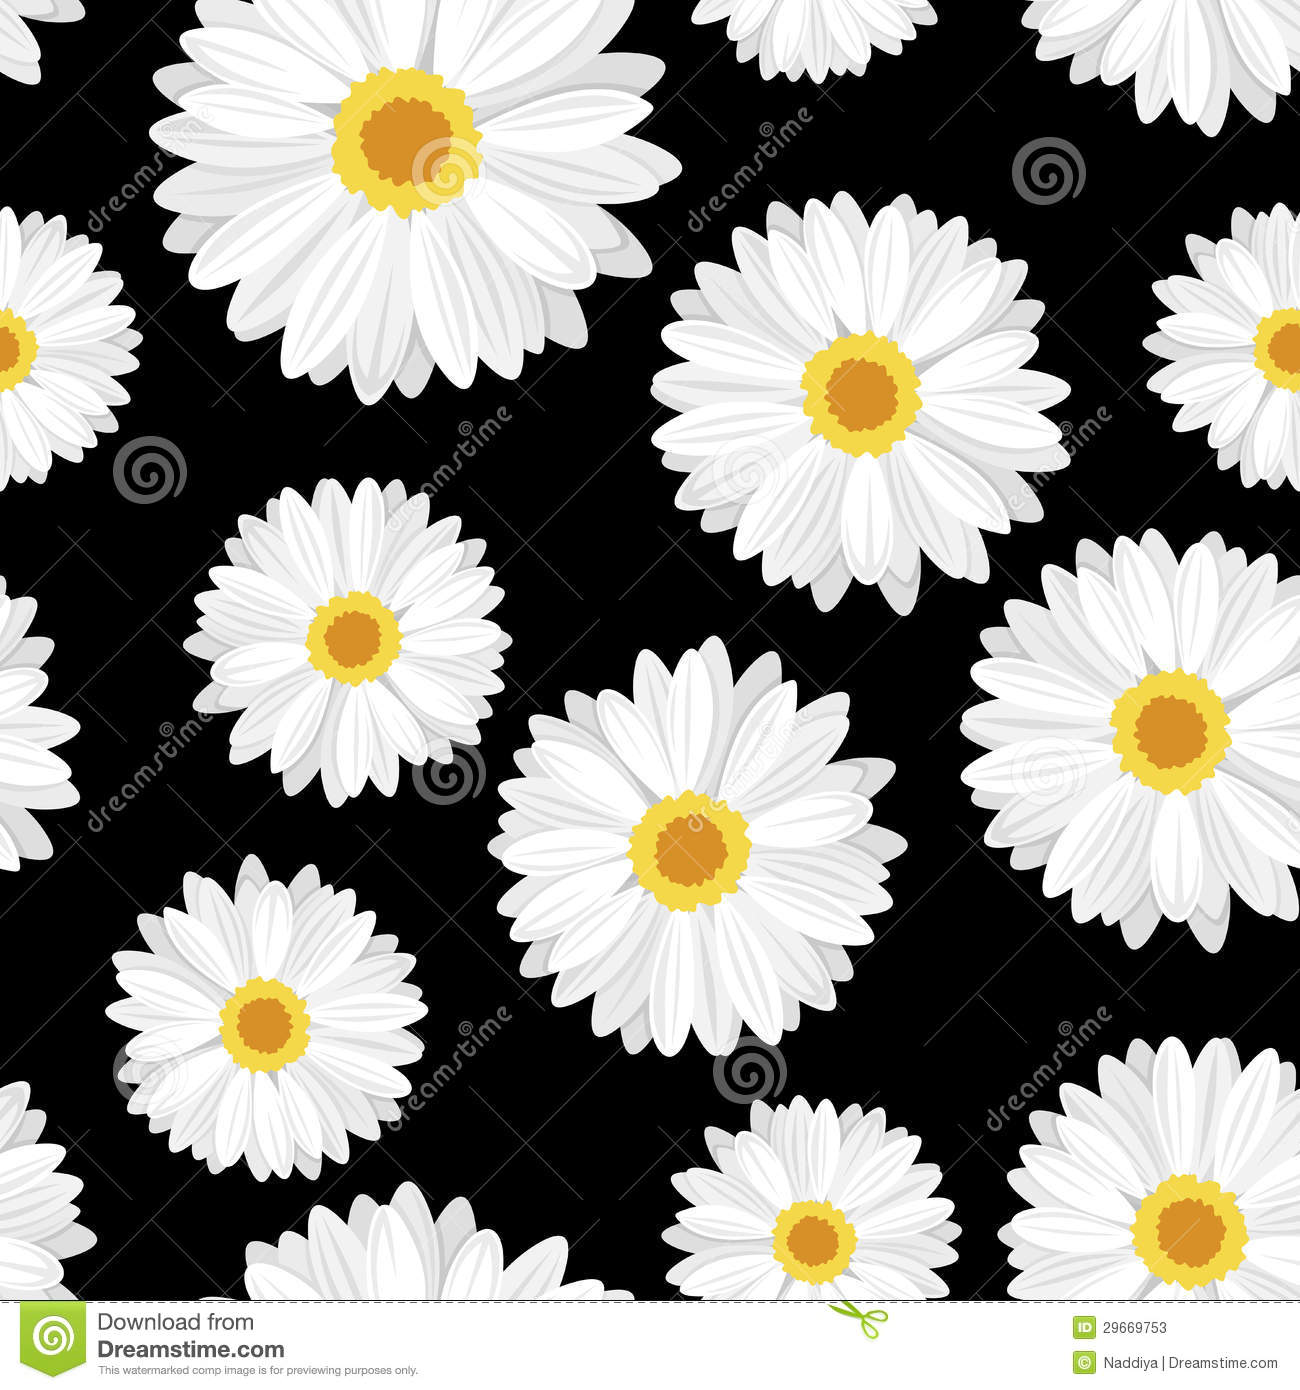 black and white daisy wallpaper wallpapersafari